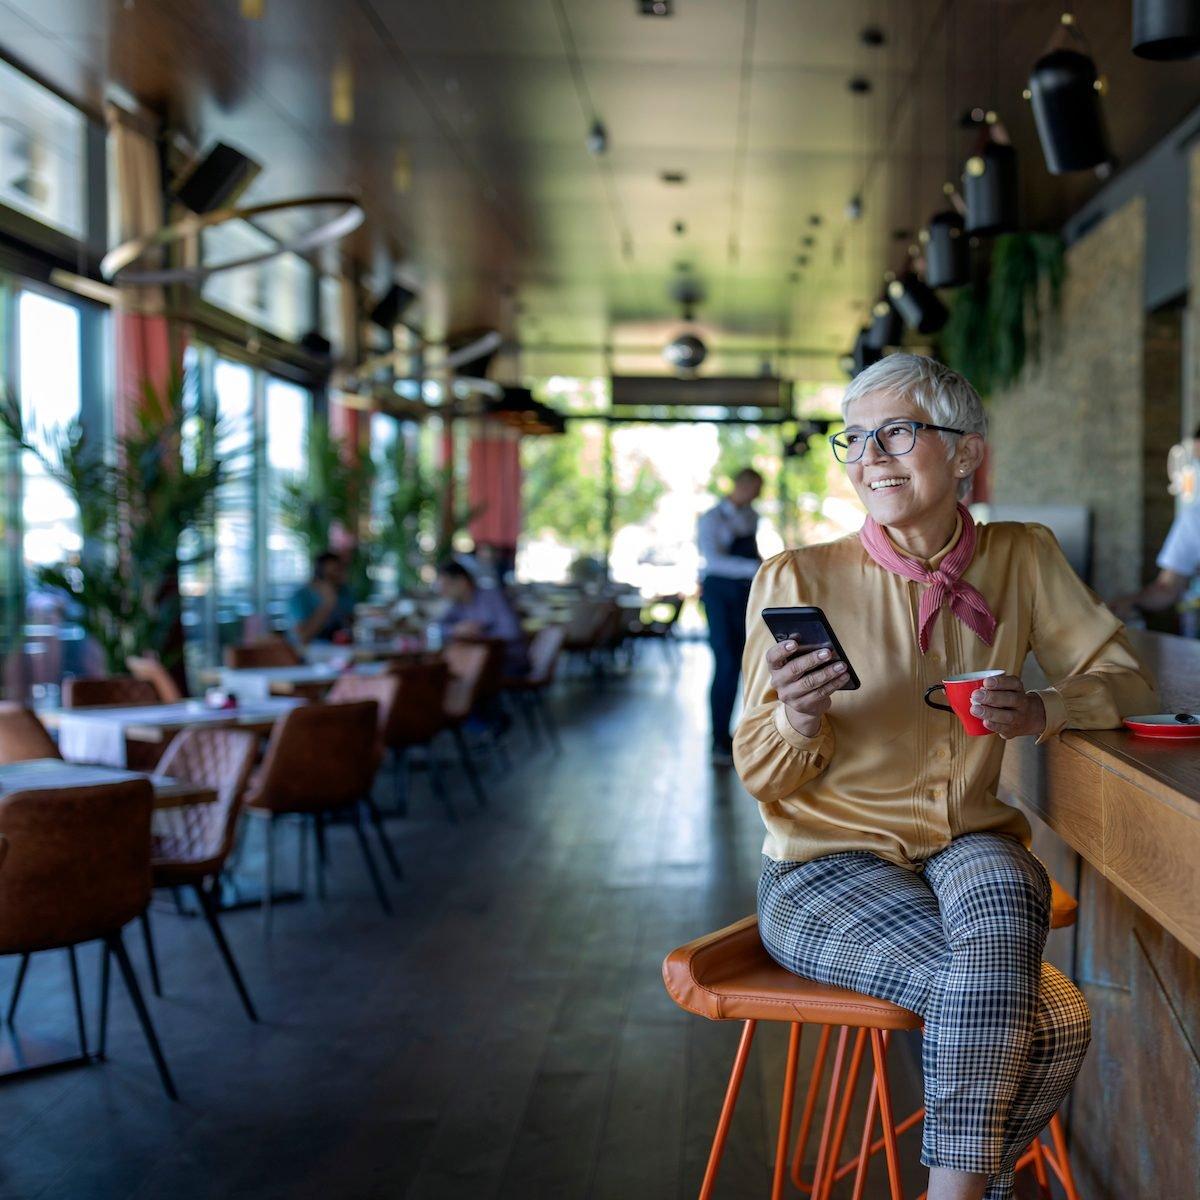 Woman alone in restaurant